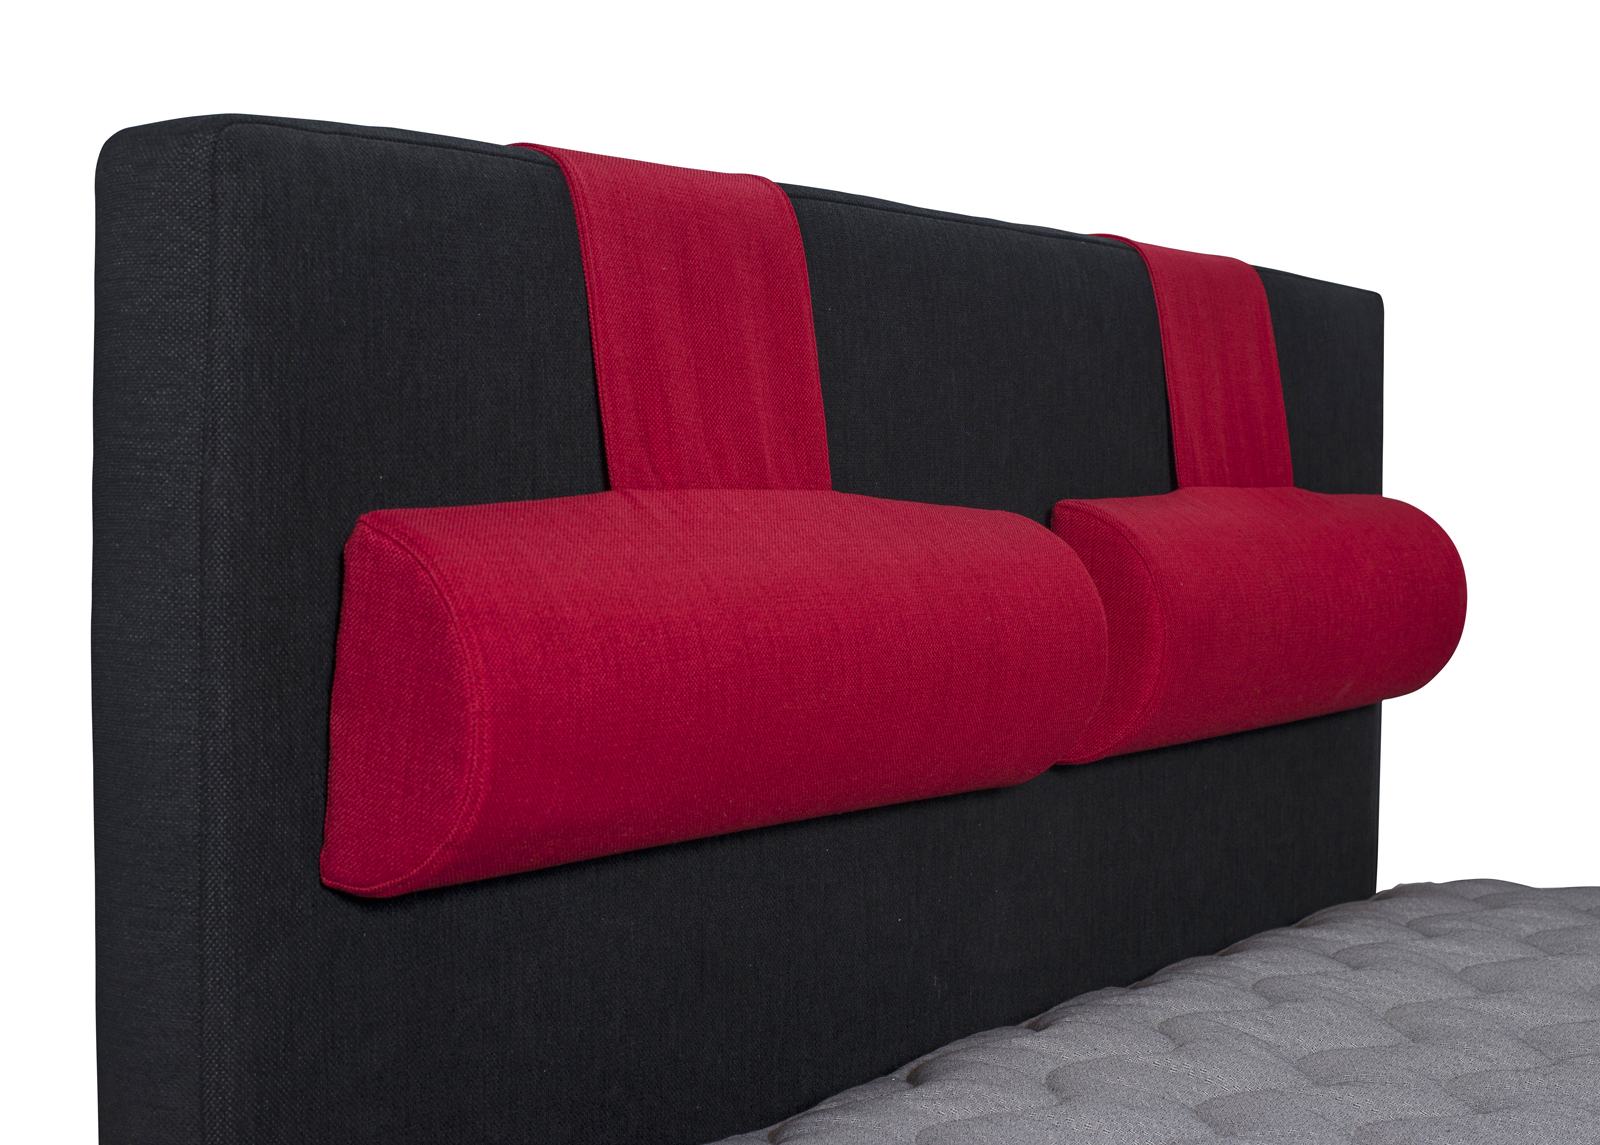 Hypnos sängynpäädyn niskatuki 60x18x10 cm, 1 kpl